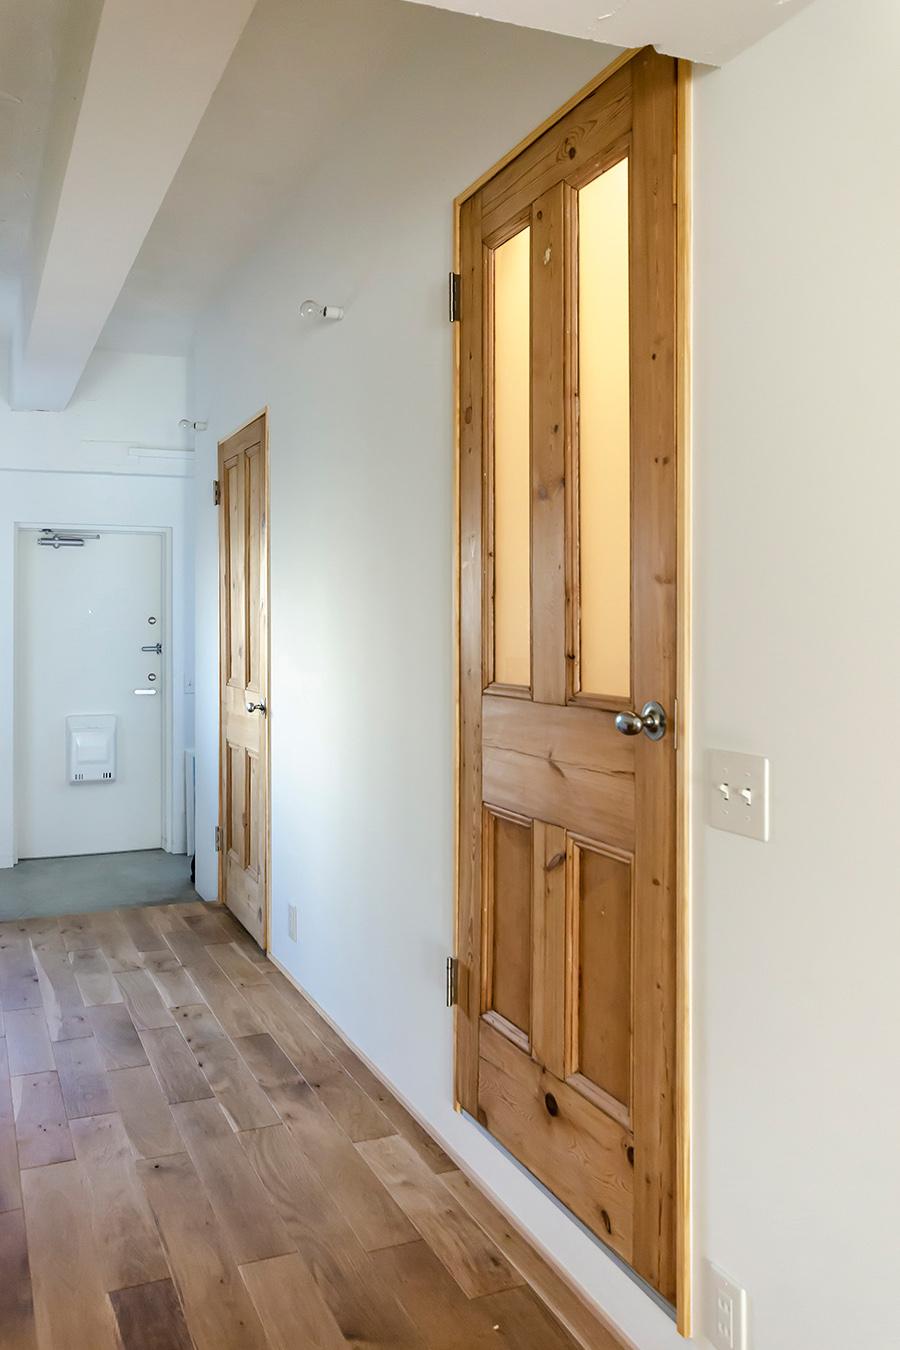 「PINE GRAIN」のパイン材アンティークドア。